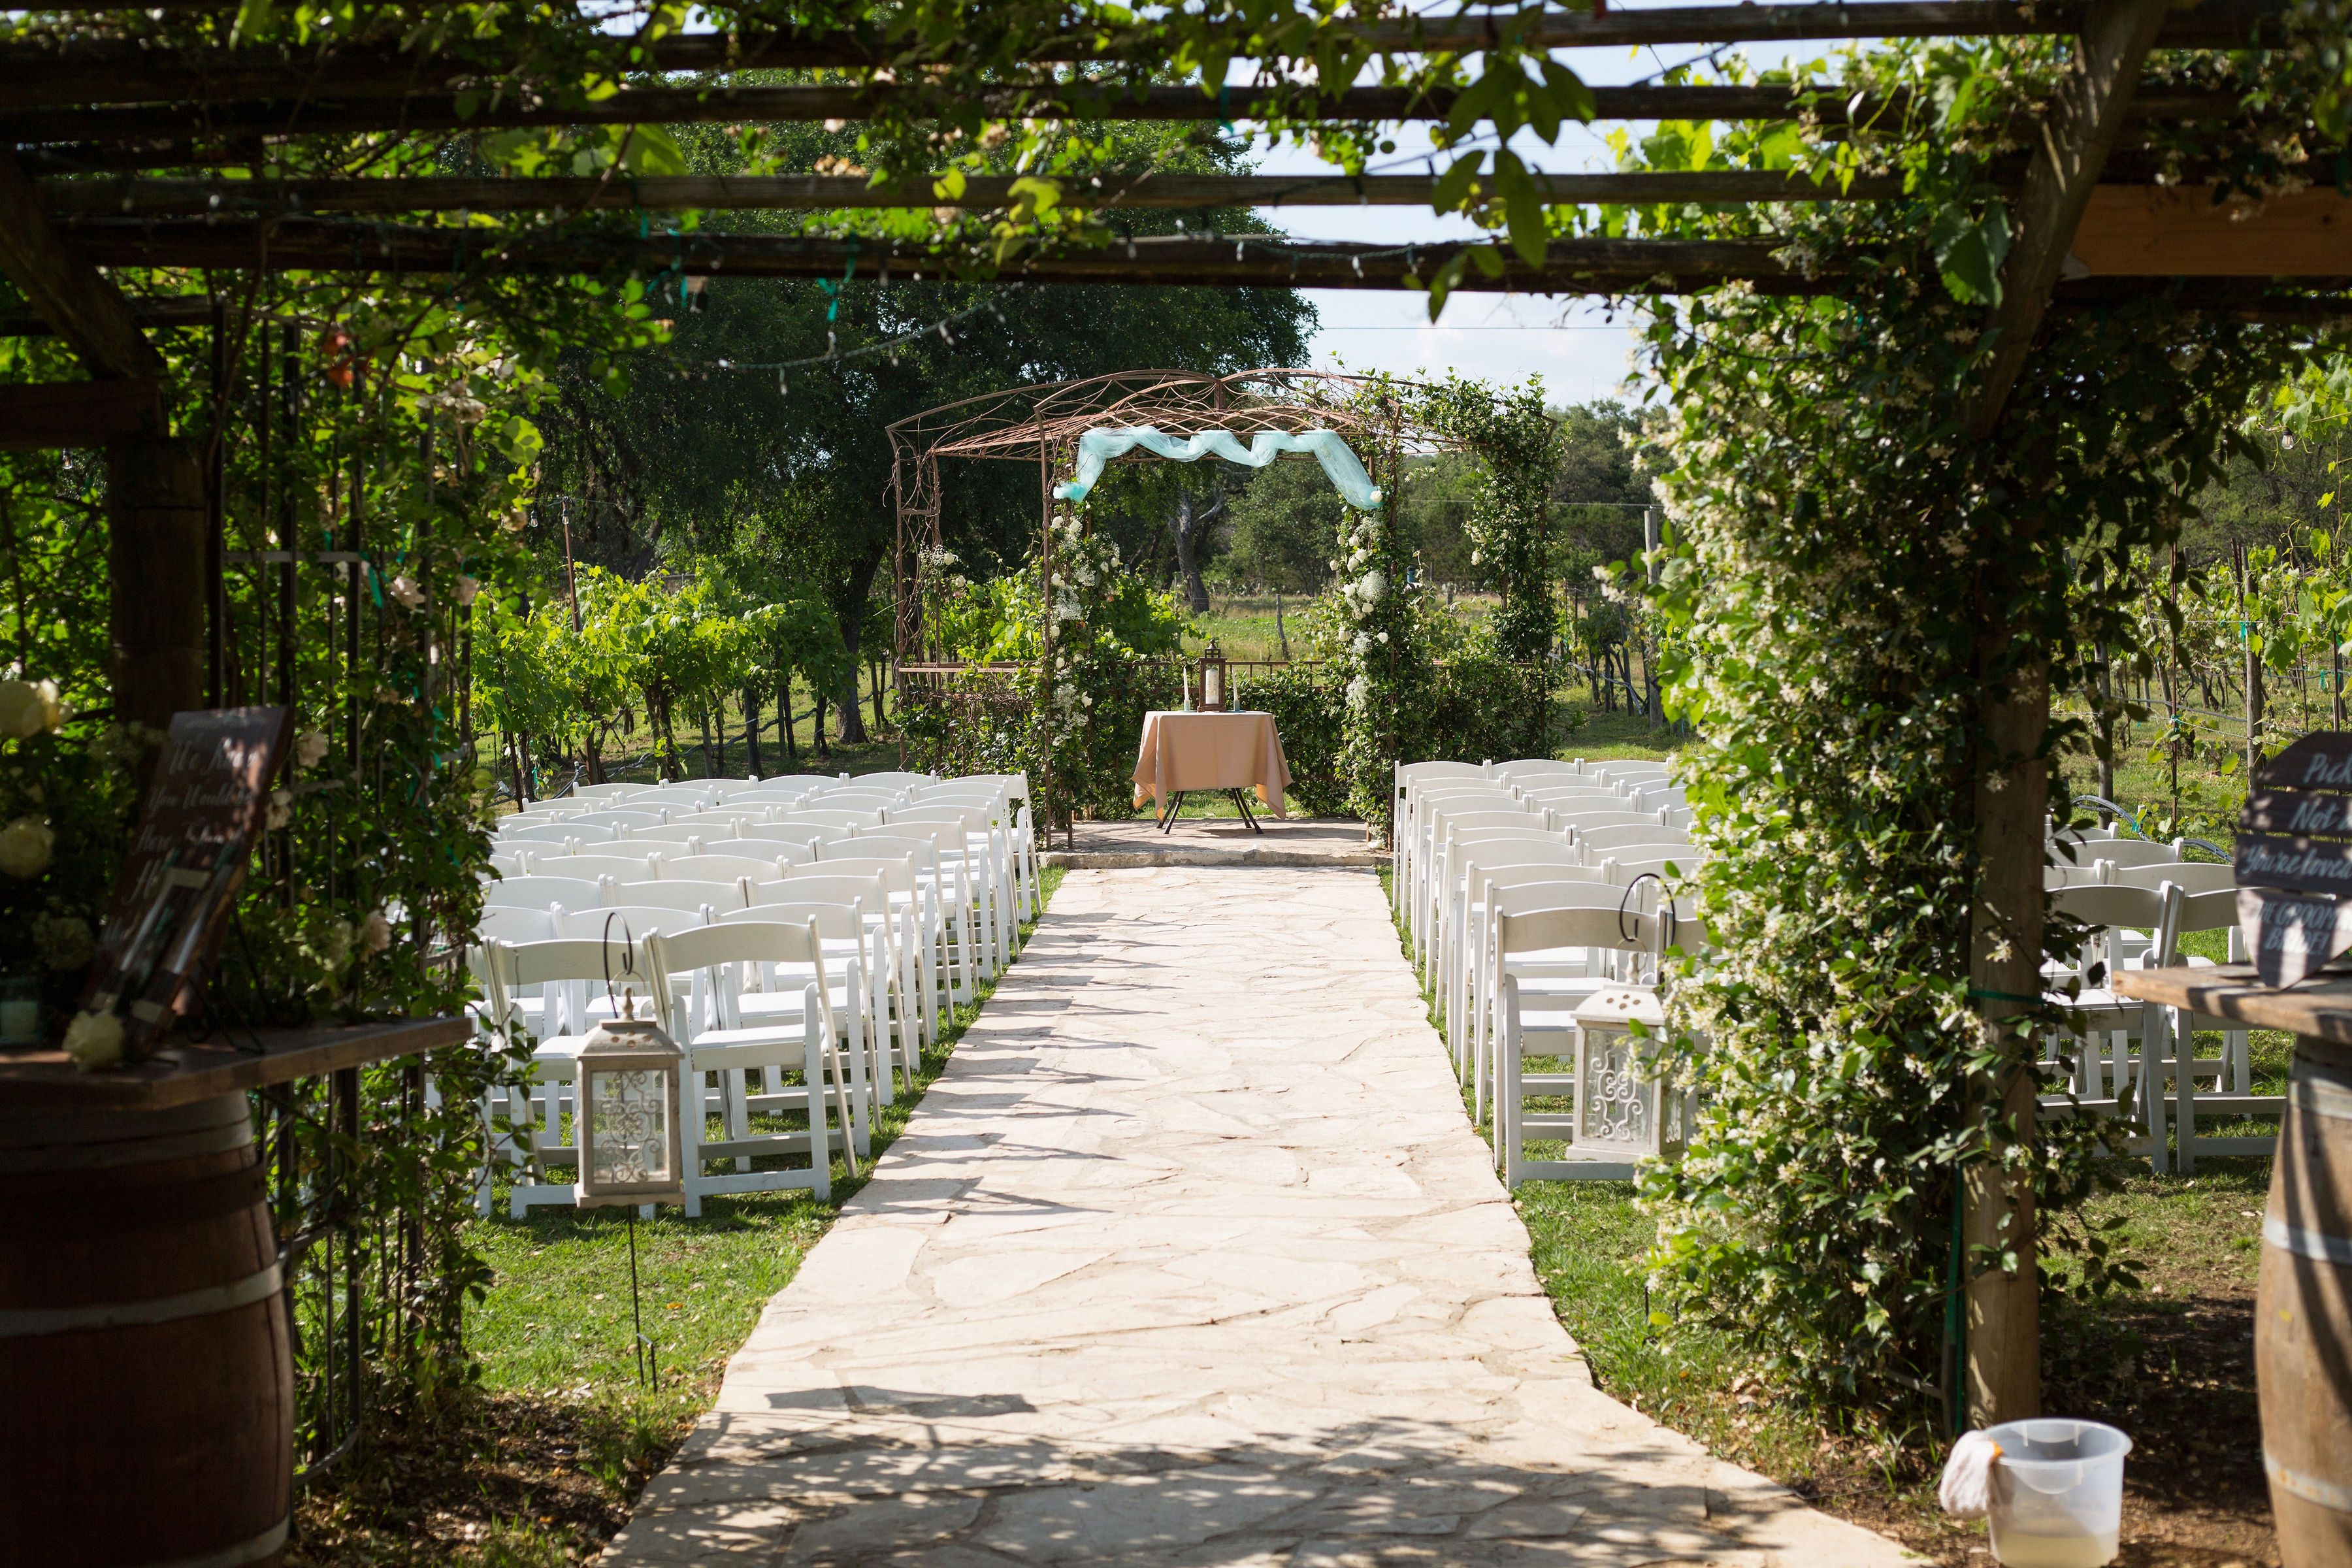 Rustic Woodsy Elegance At Oak Valley Vineyards Real Wedding Alyssa Dolan Julia Corinne Photo Dream Wedding Venues Woodsy Real Weddings